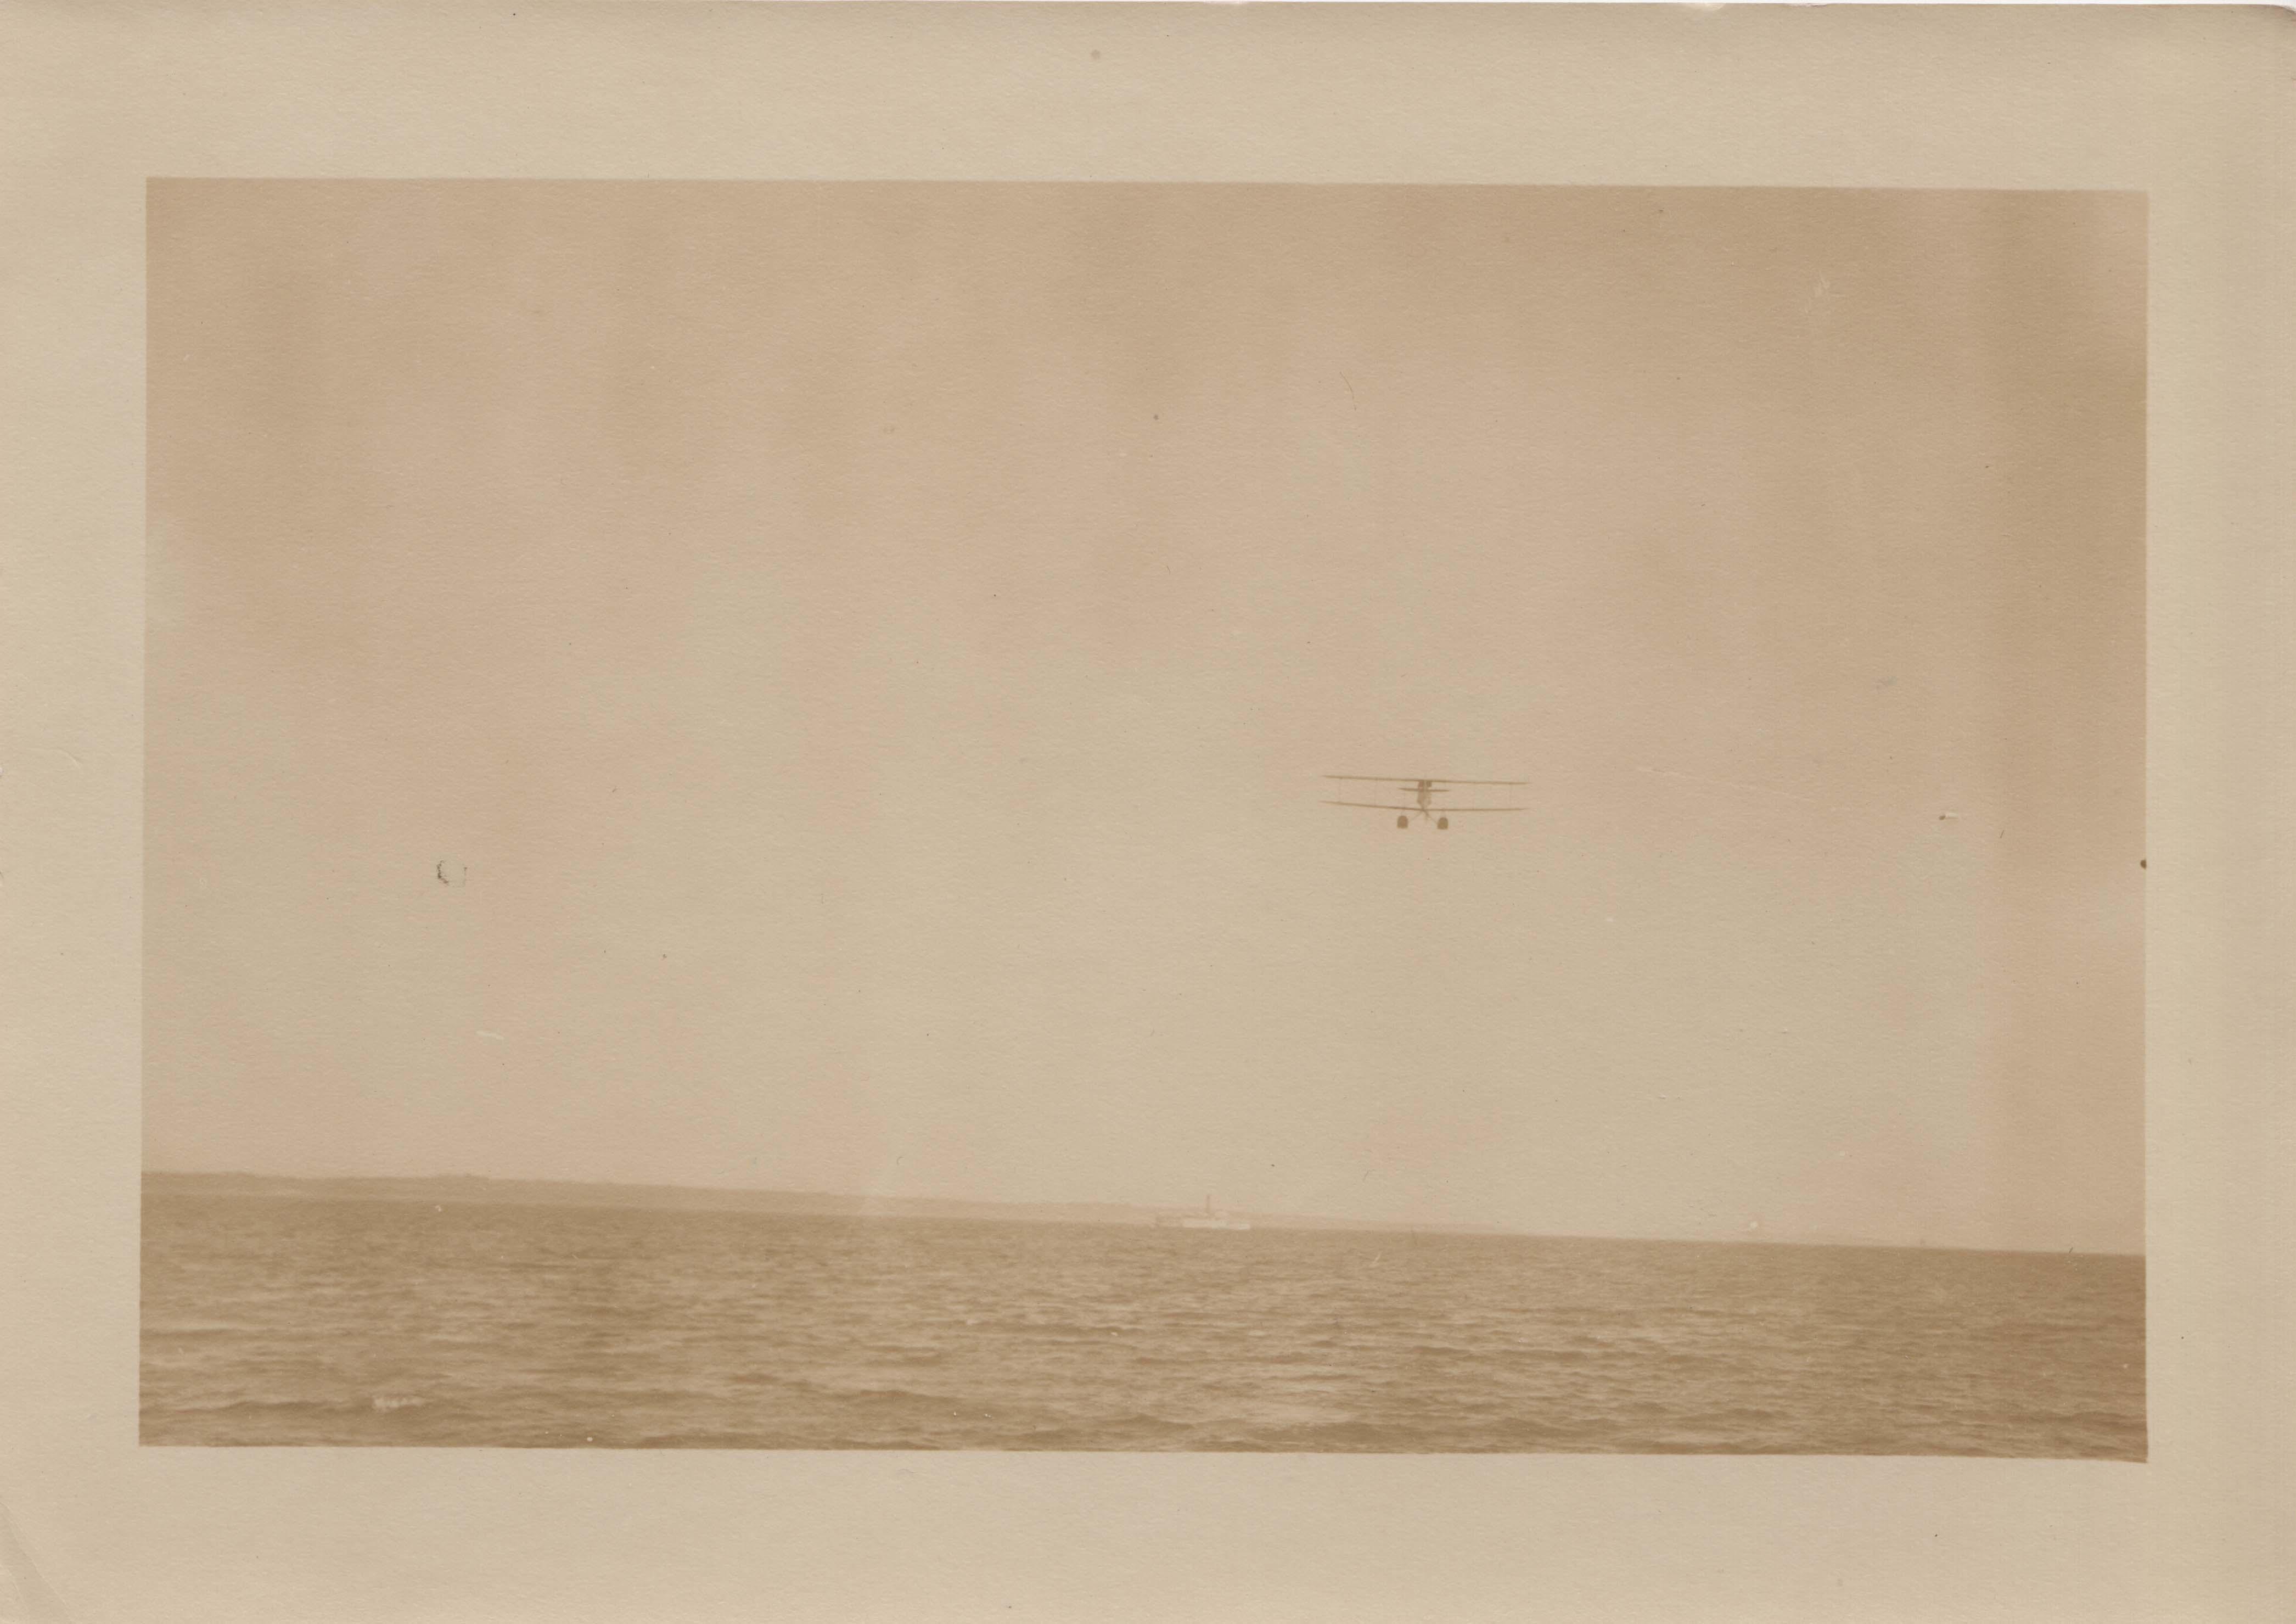 0062 Aeroplane above water